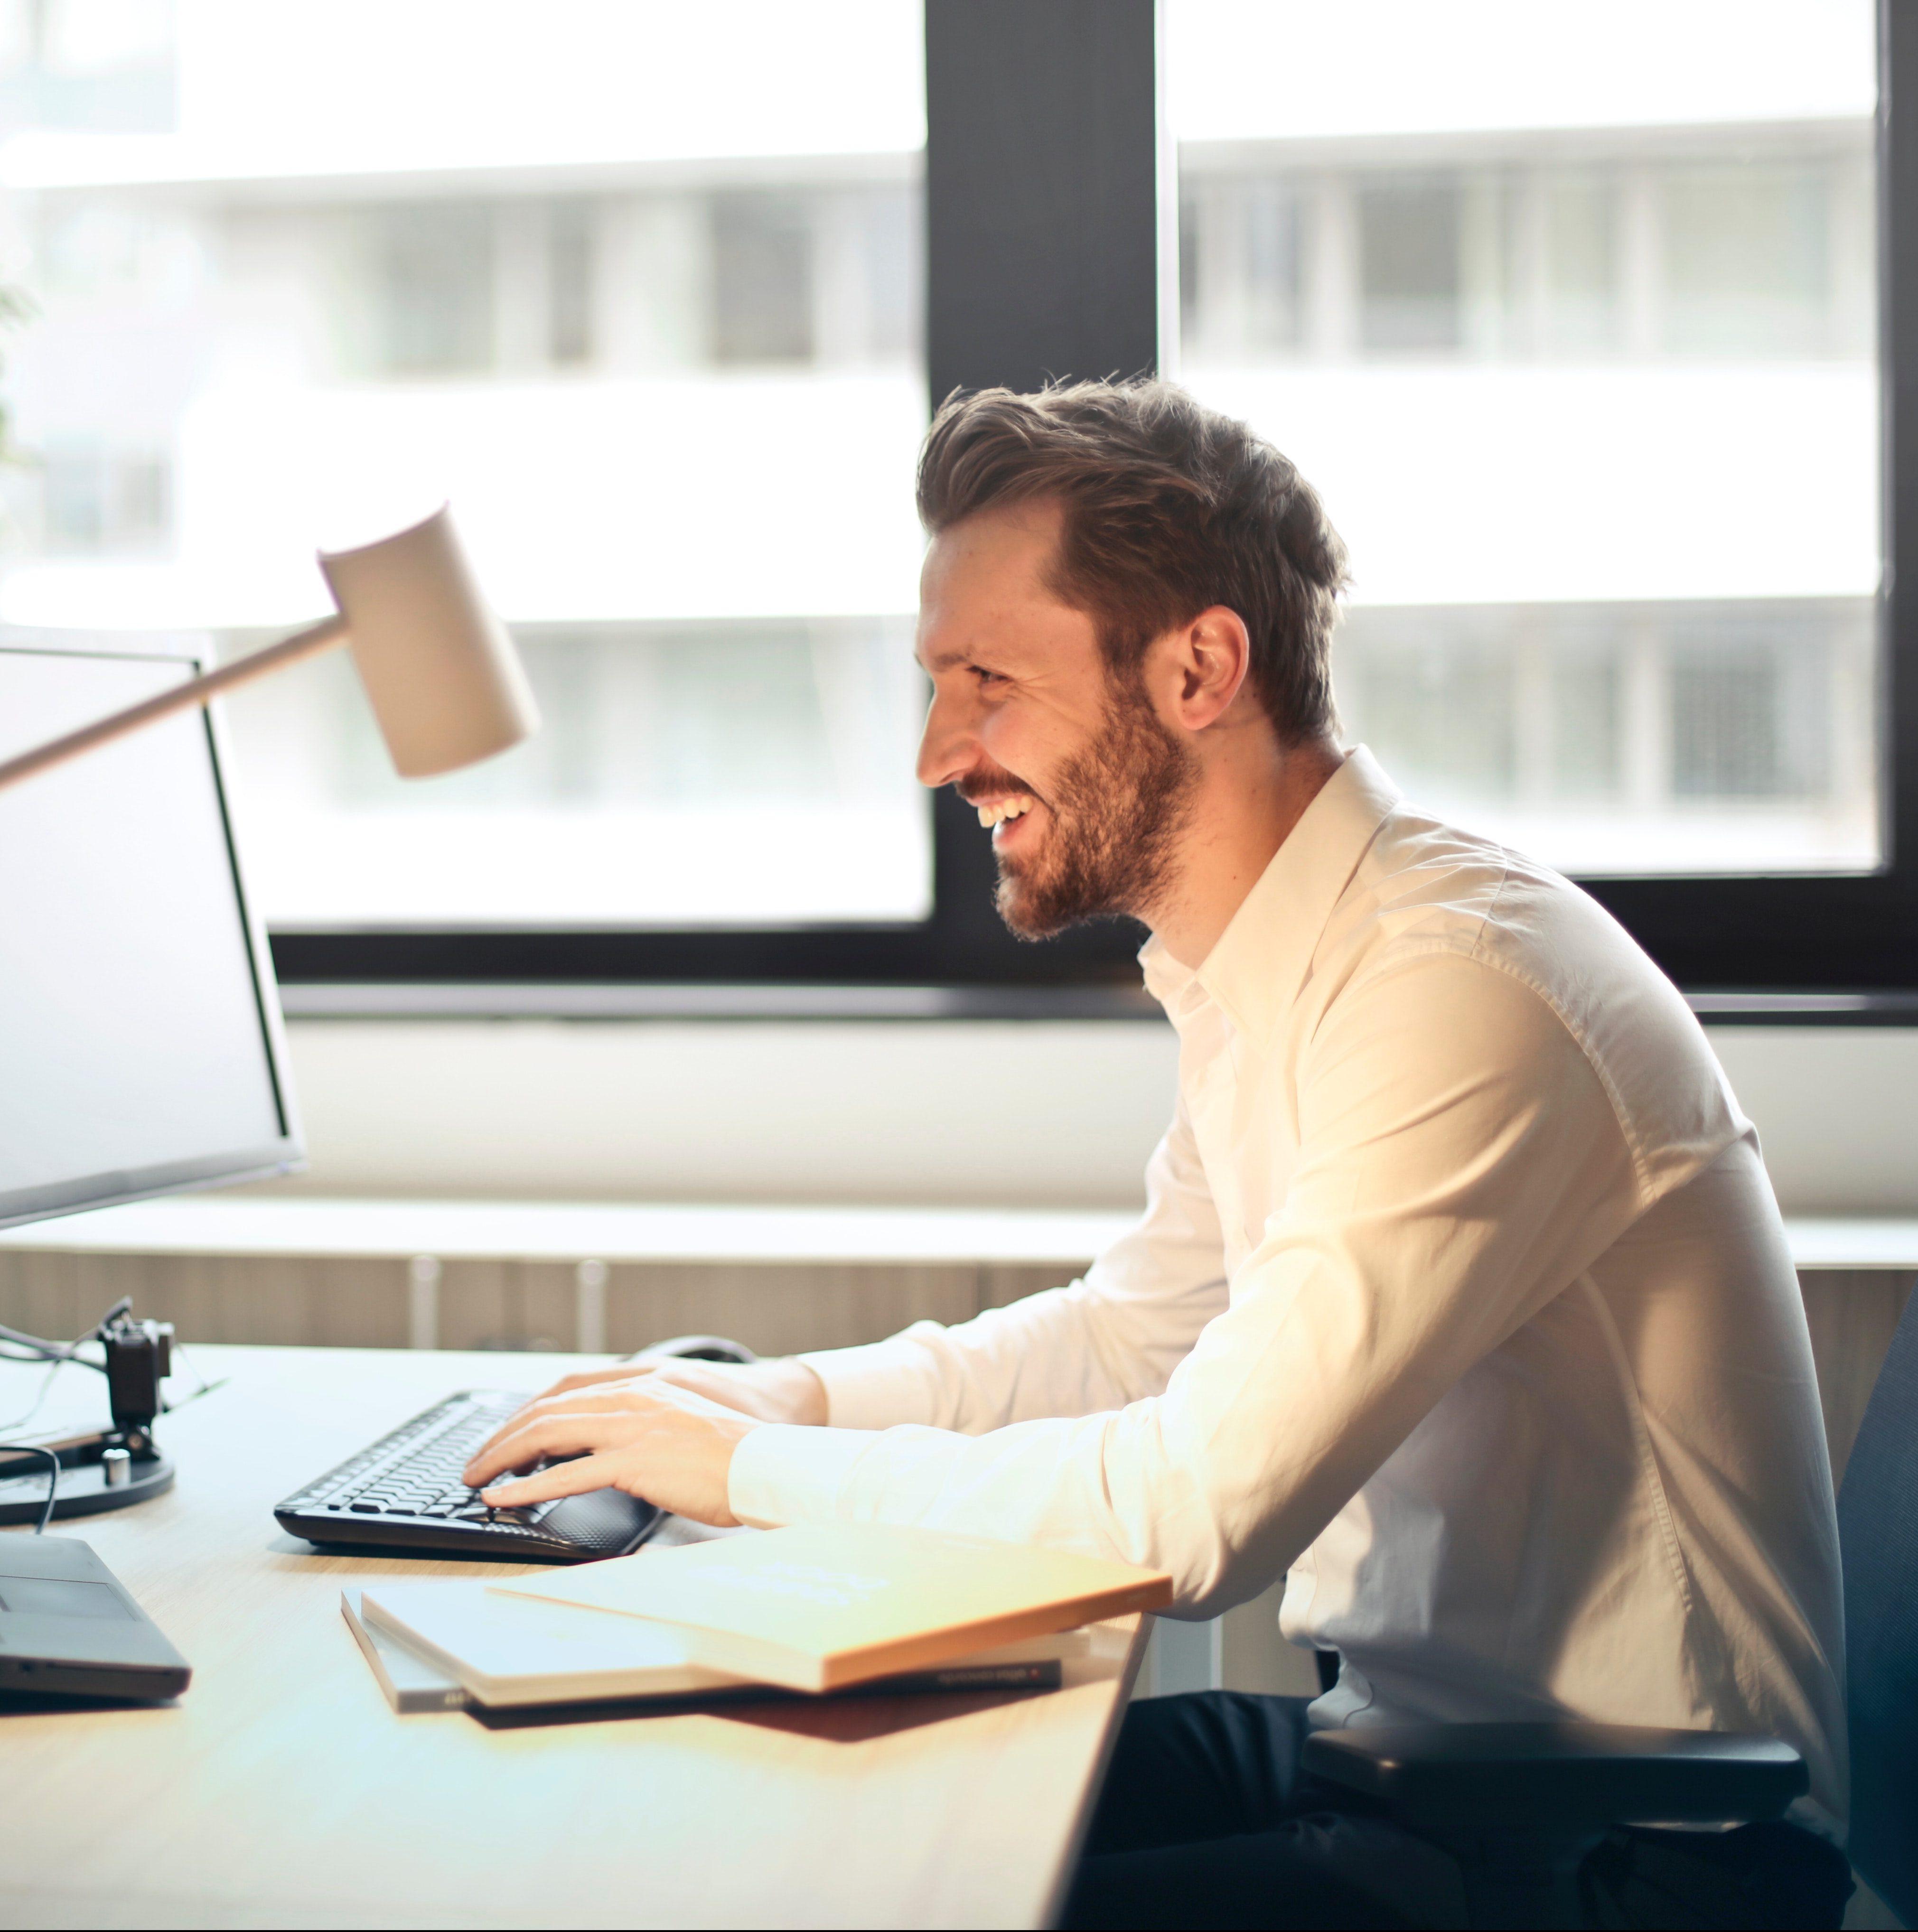 Man working at desktop computer